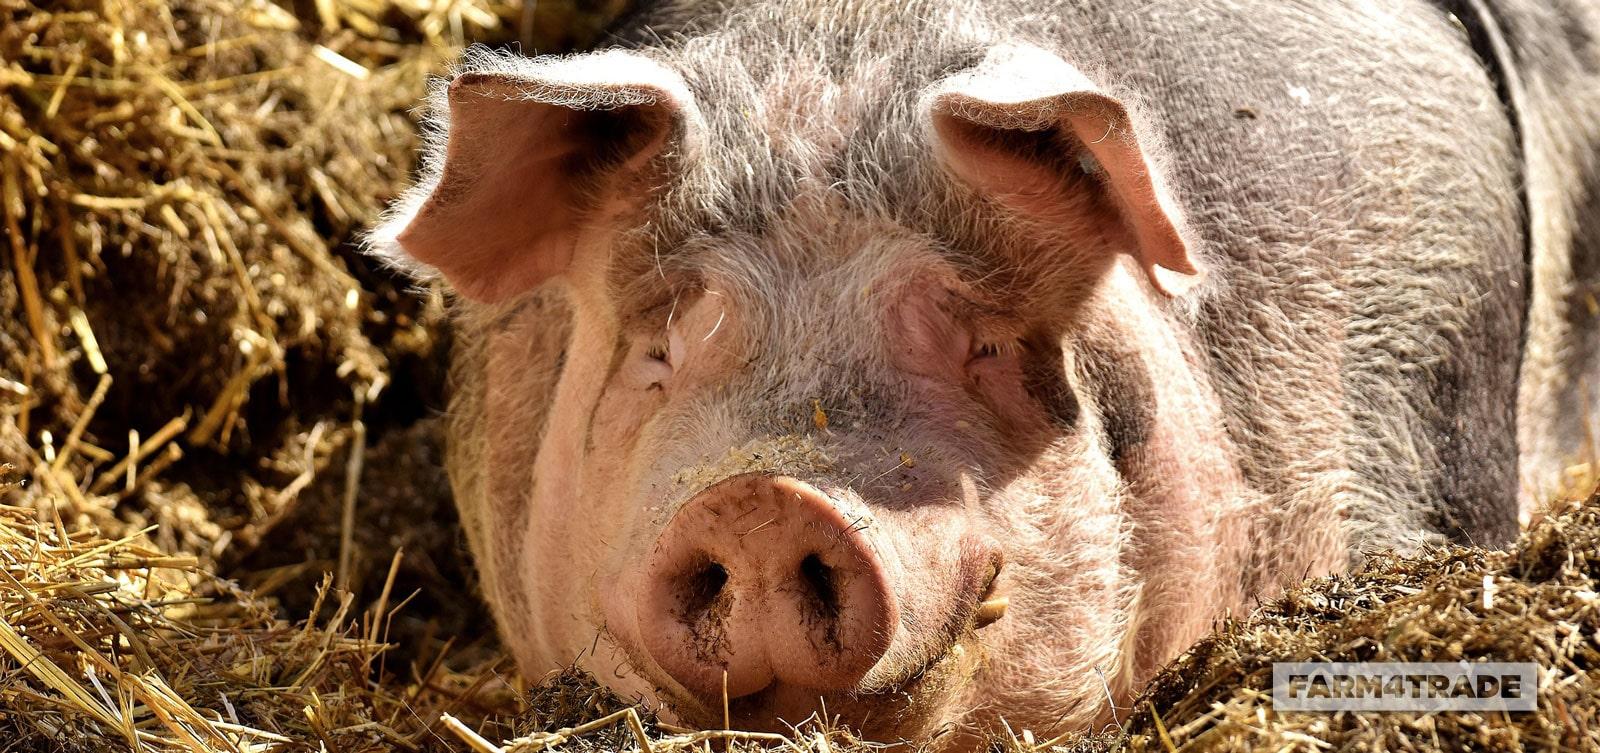 Raising-pigs_a-pig-farming-guide-for-beginners-Farm4Trade